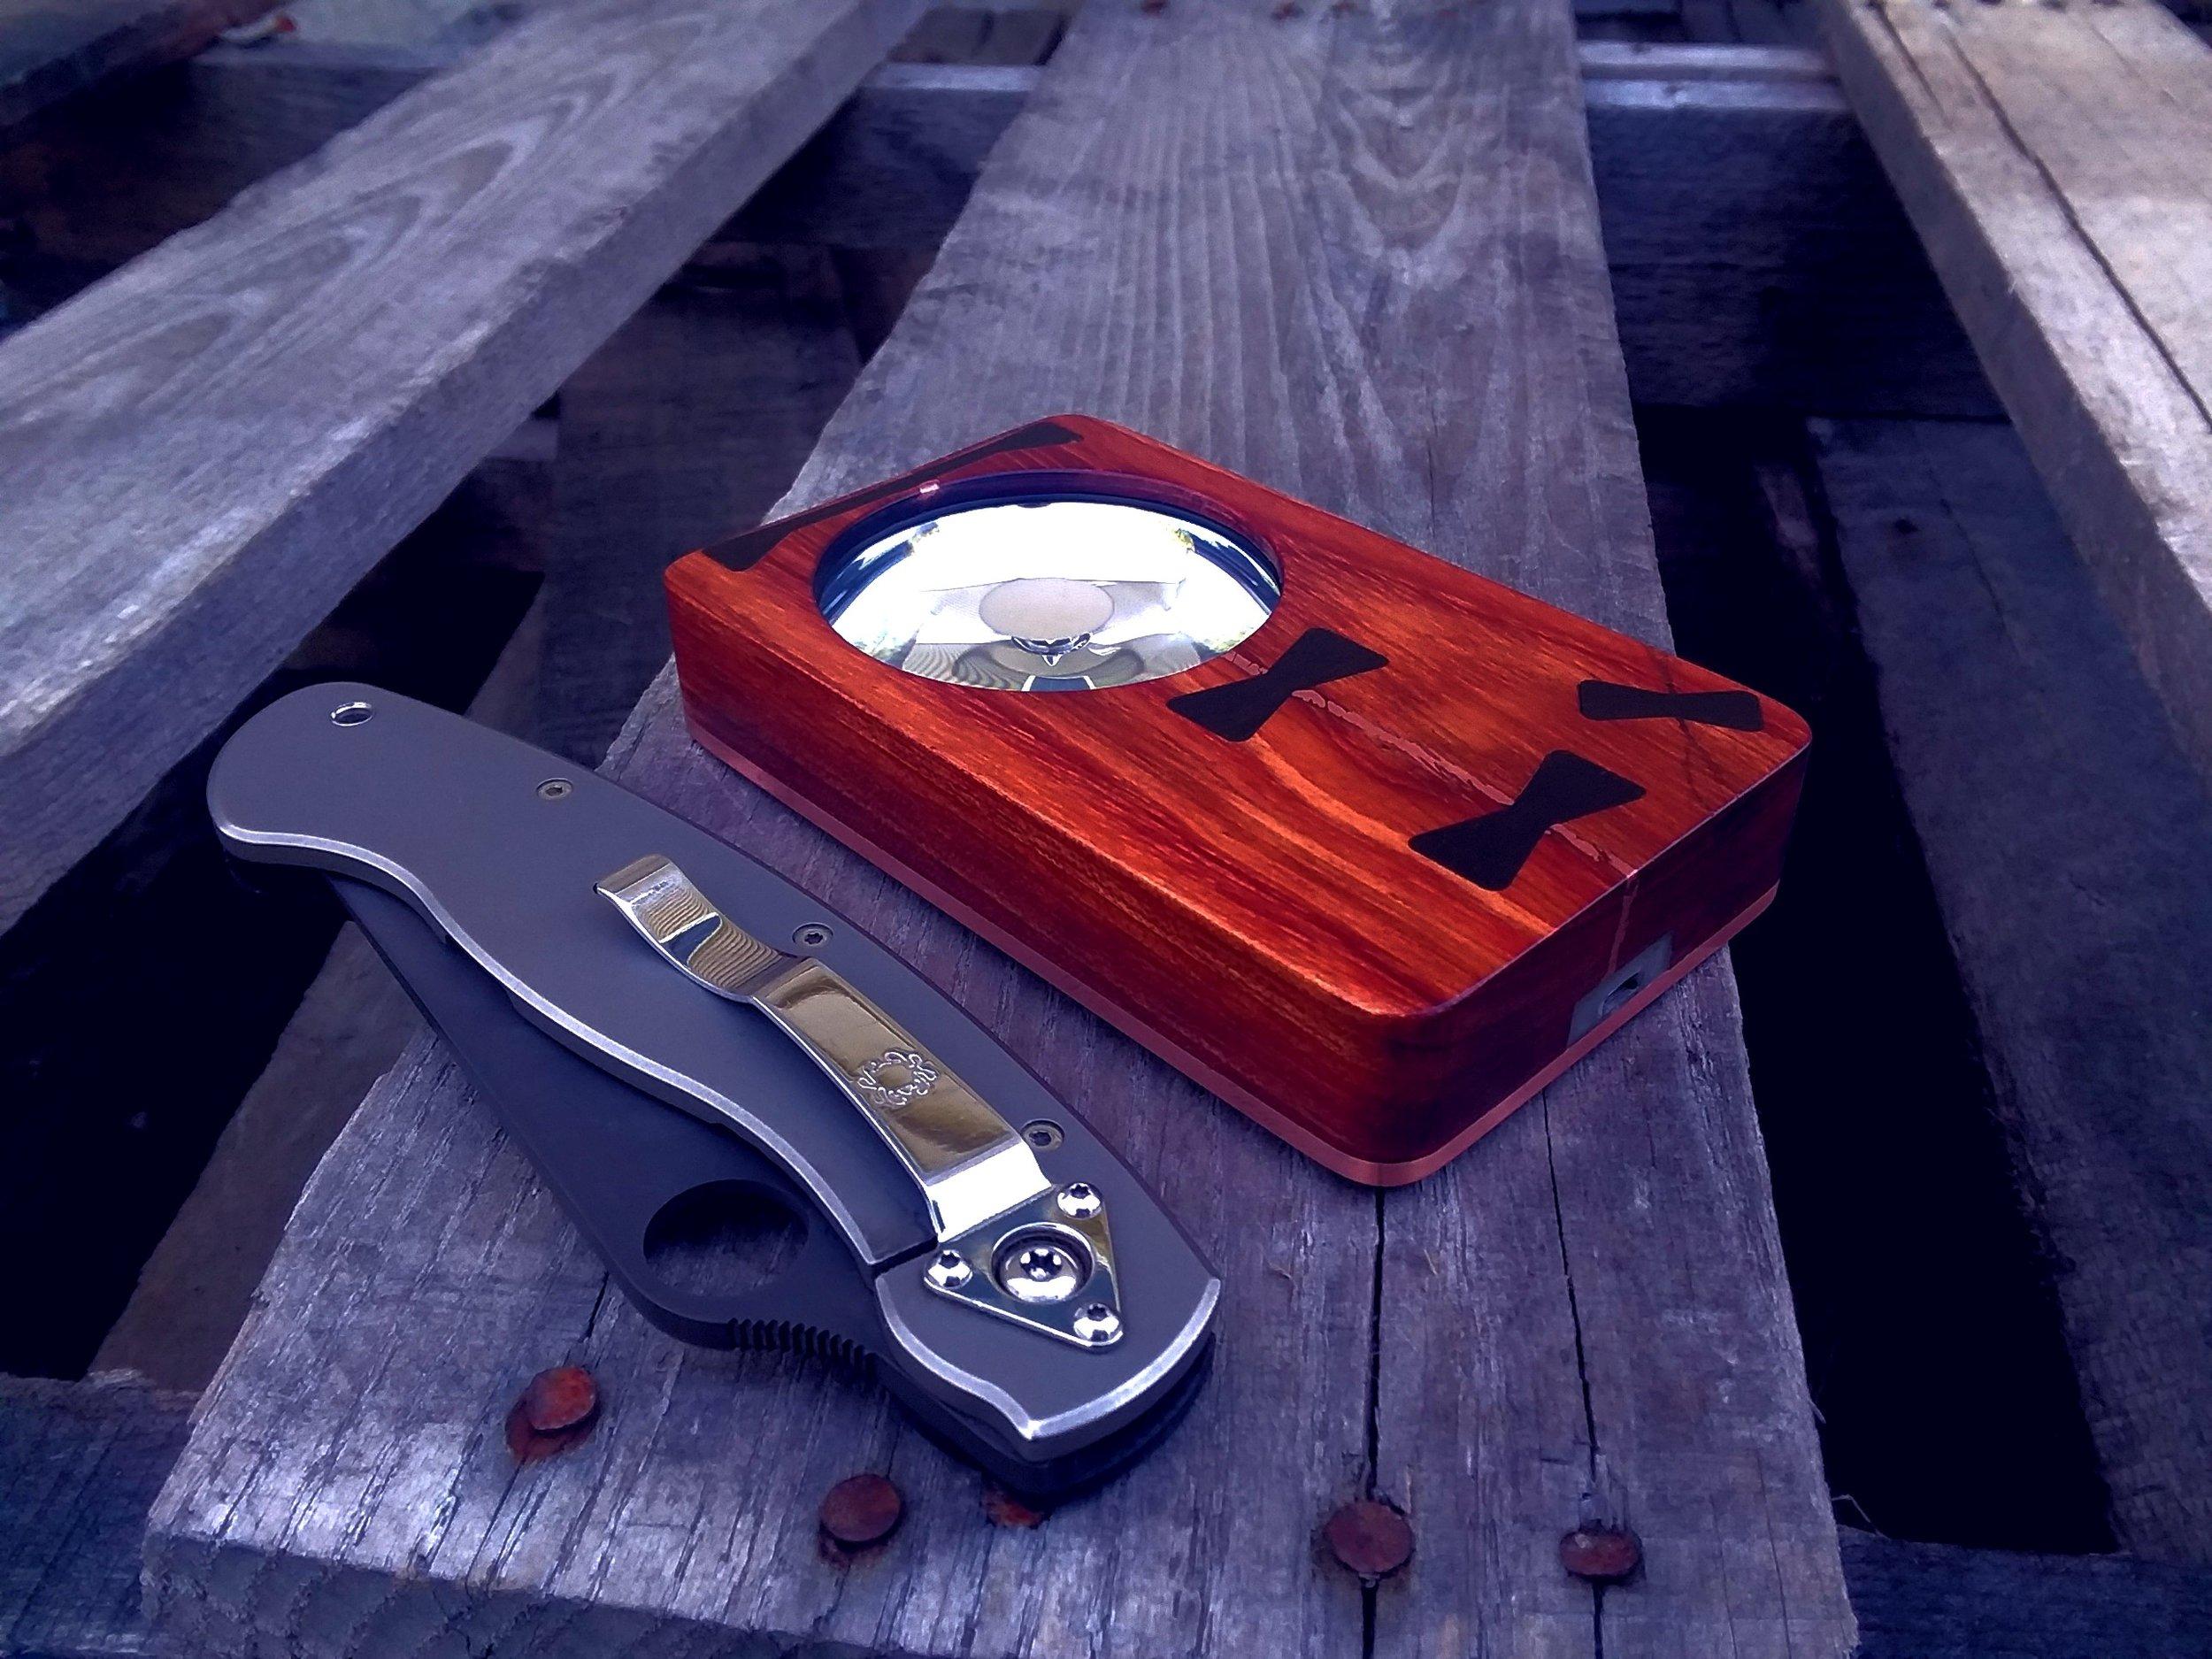 Eye of Sekhmet bubinga w/ ebony keys and copper inlay over Cu, Custom Spyderco military Ti/g10